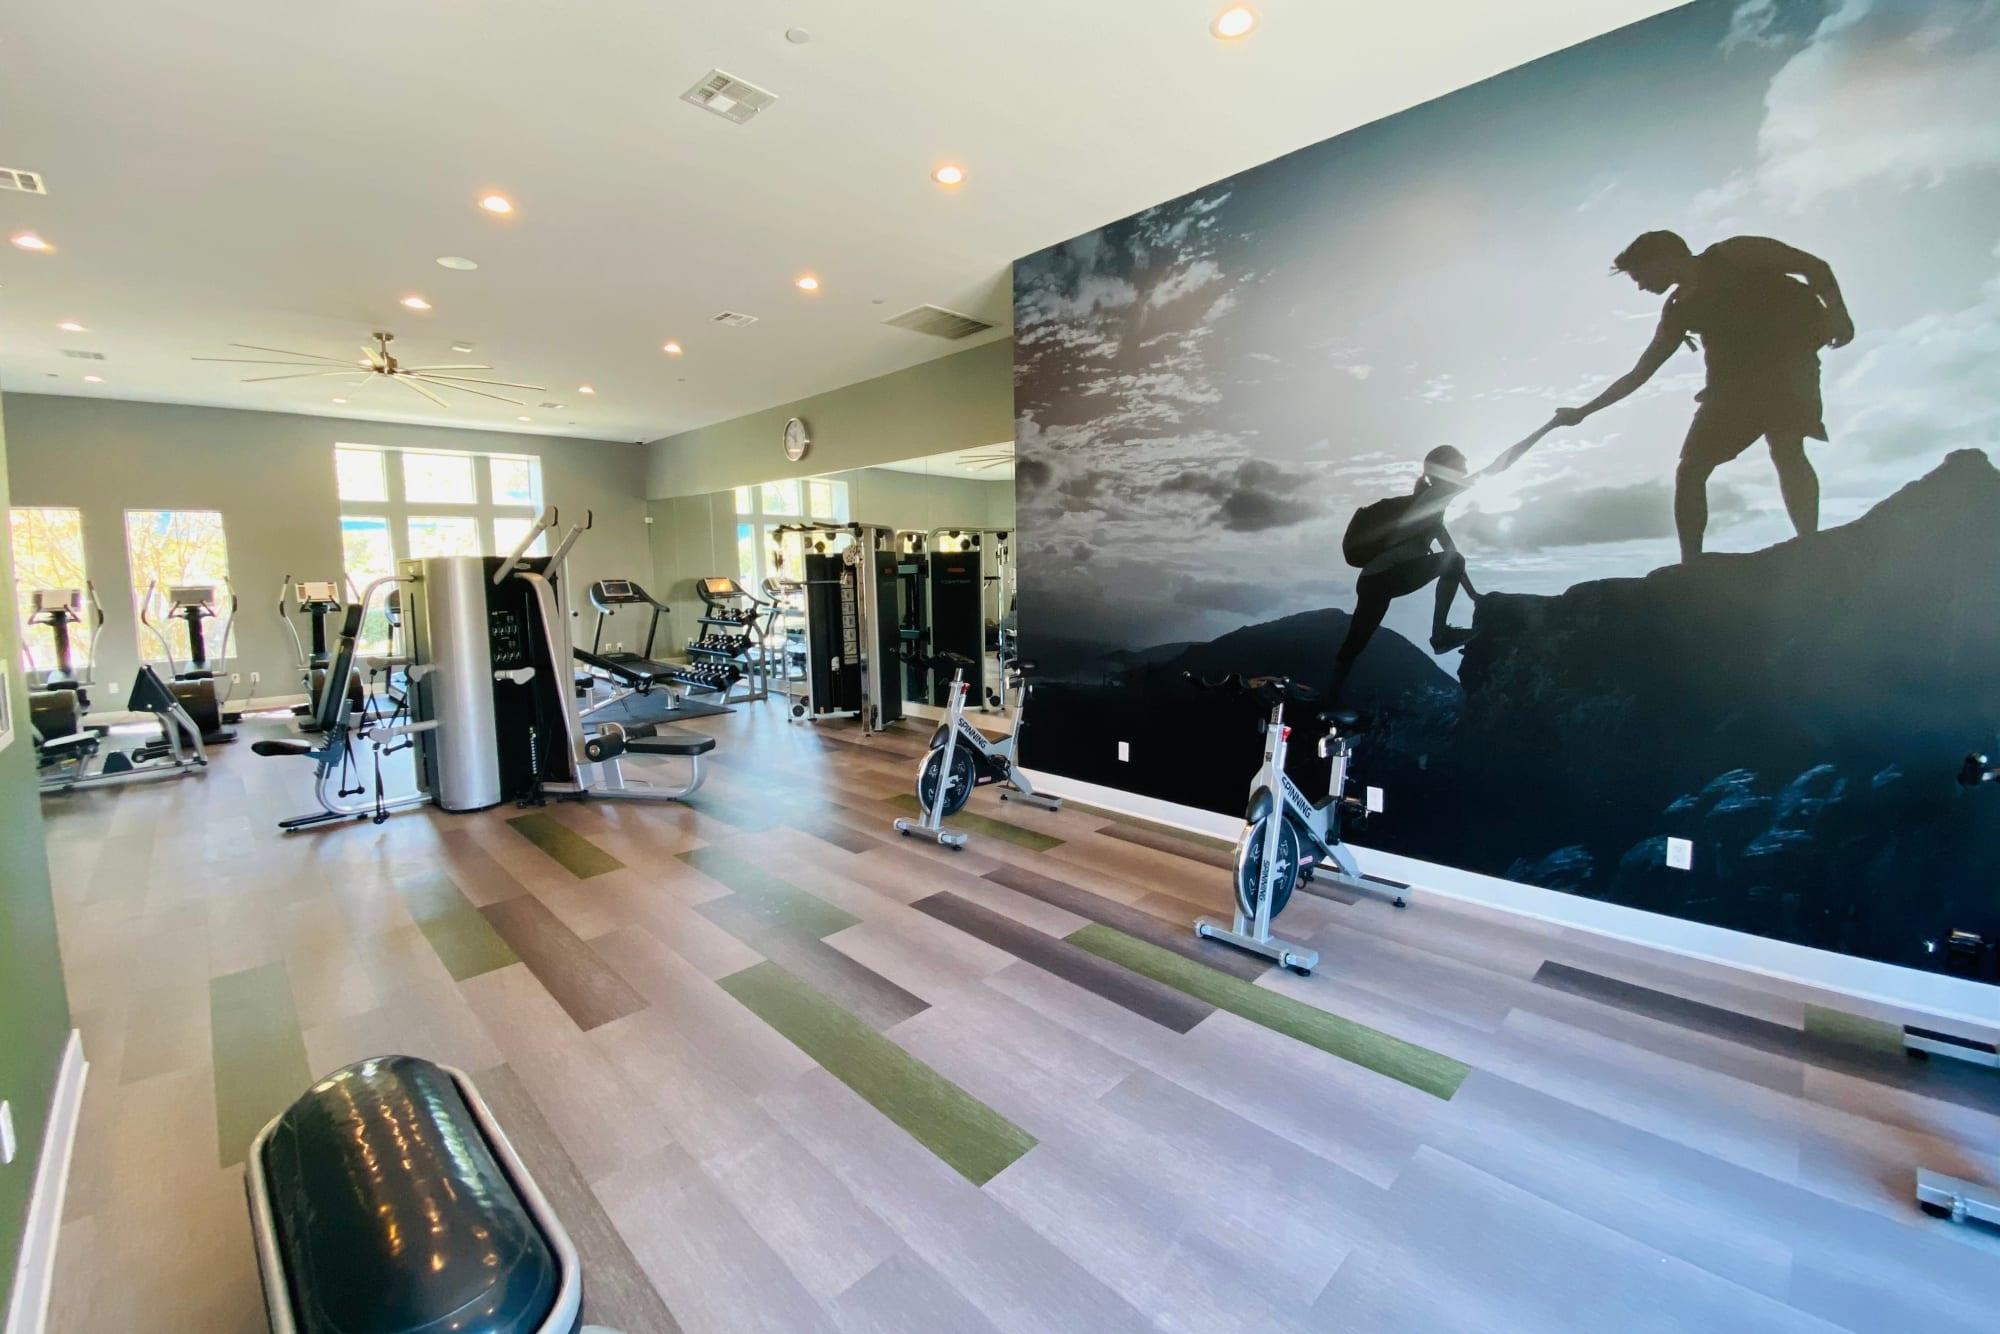 The fitness center at Palisades Sierra Del Oro in Corona, California